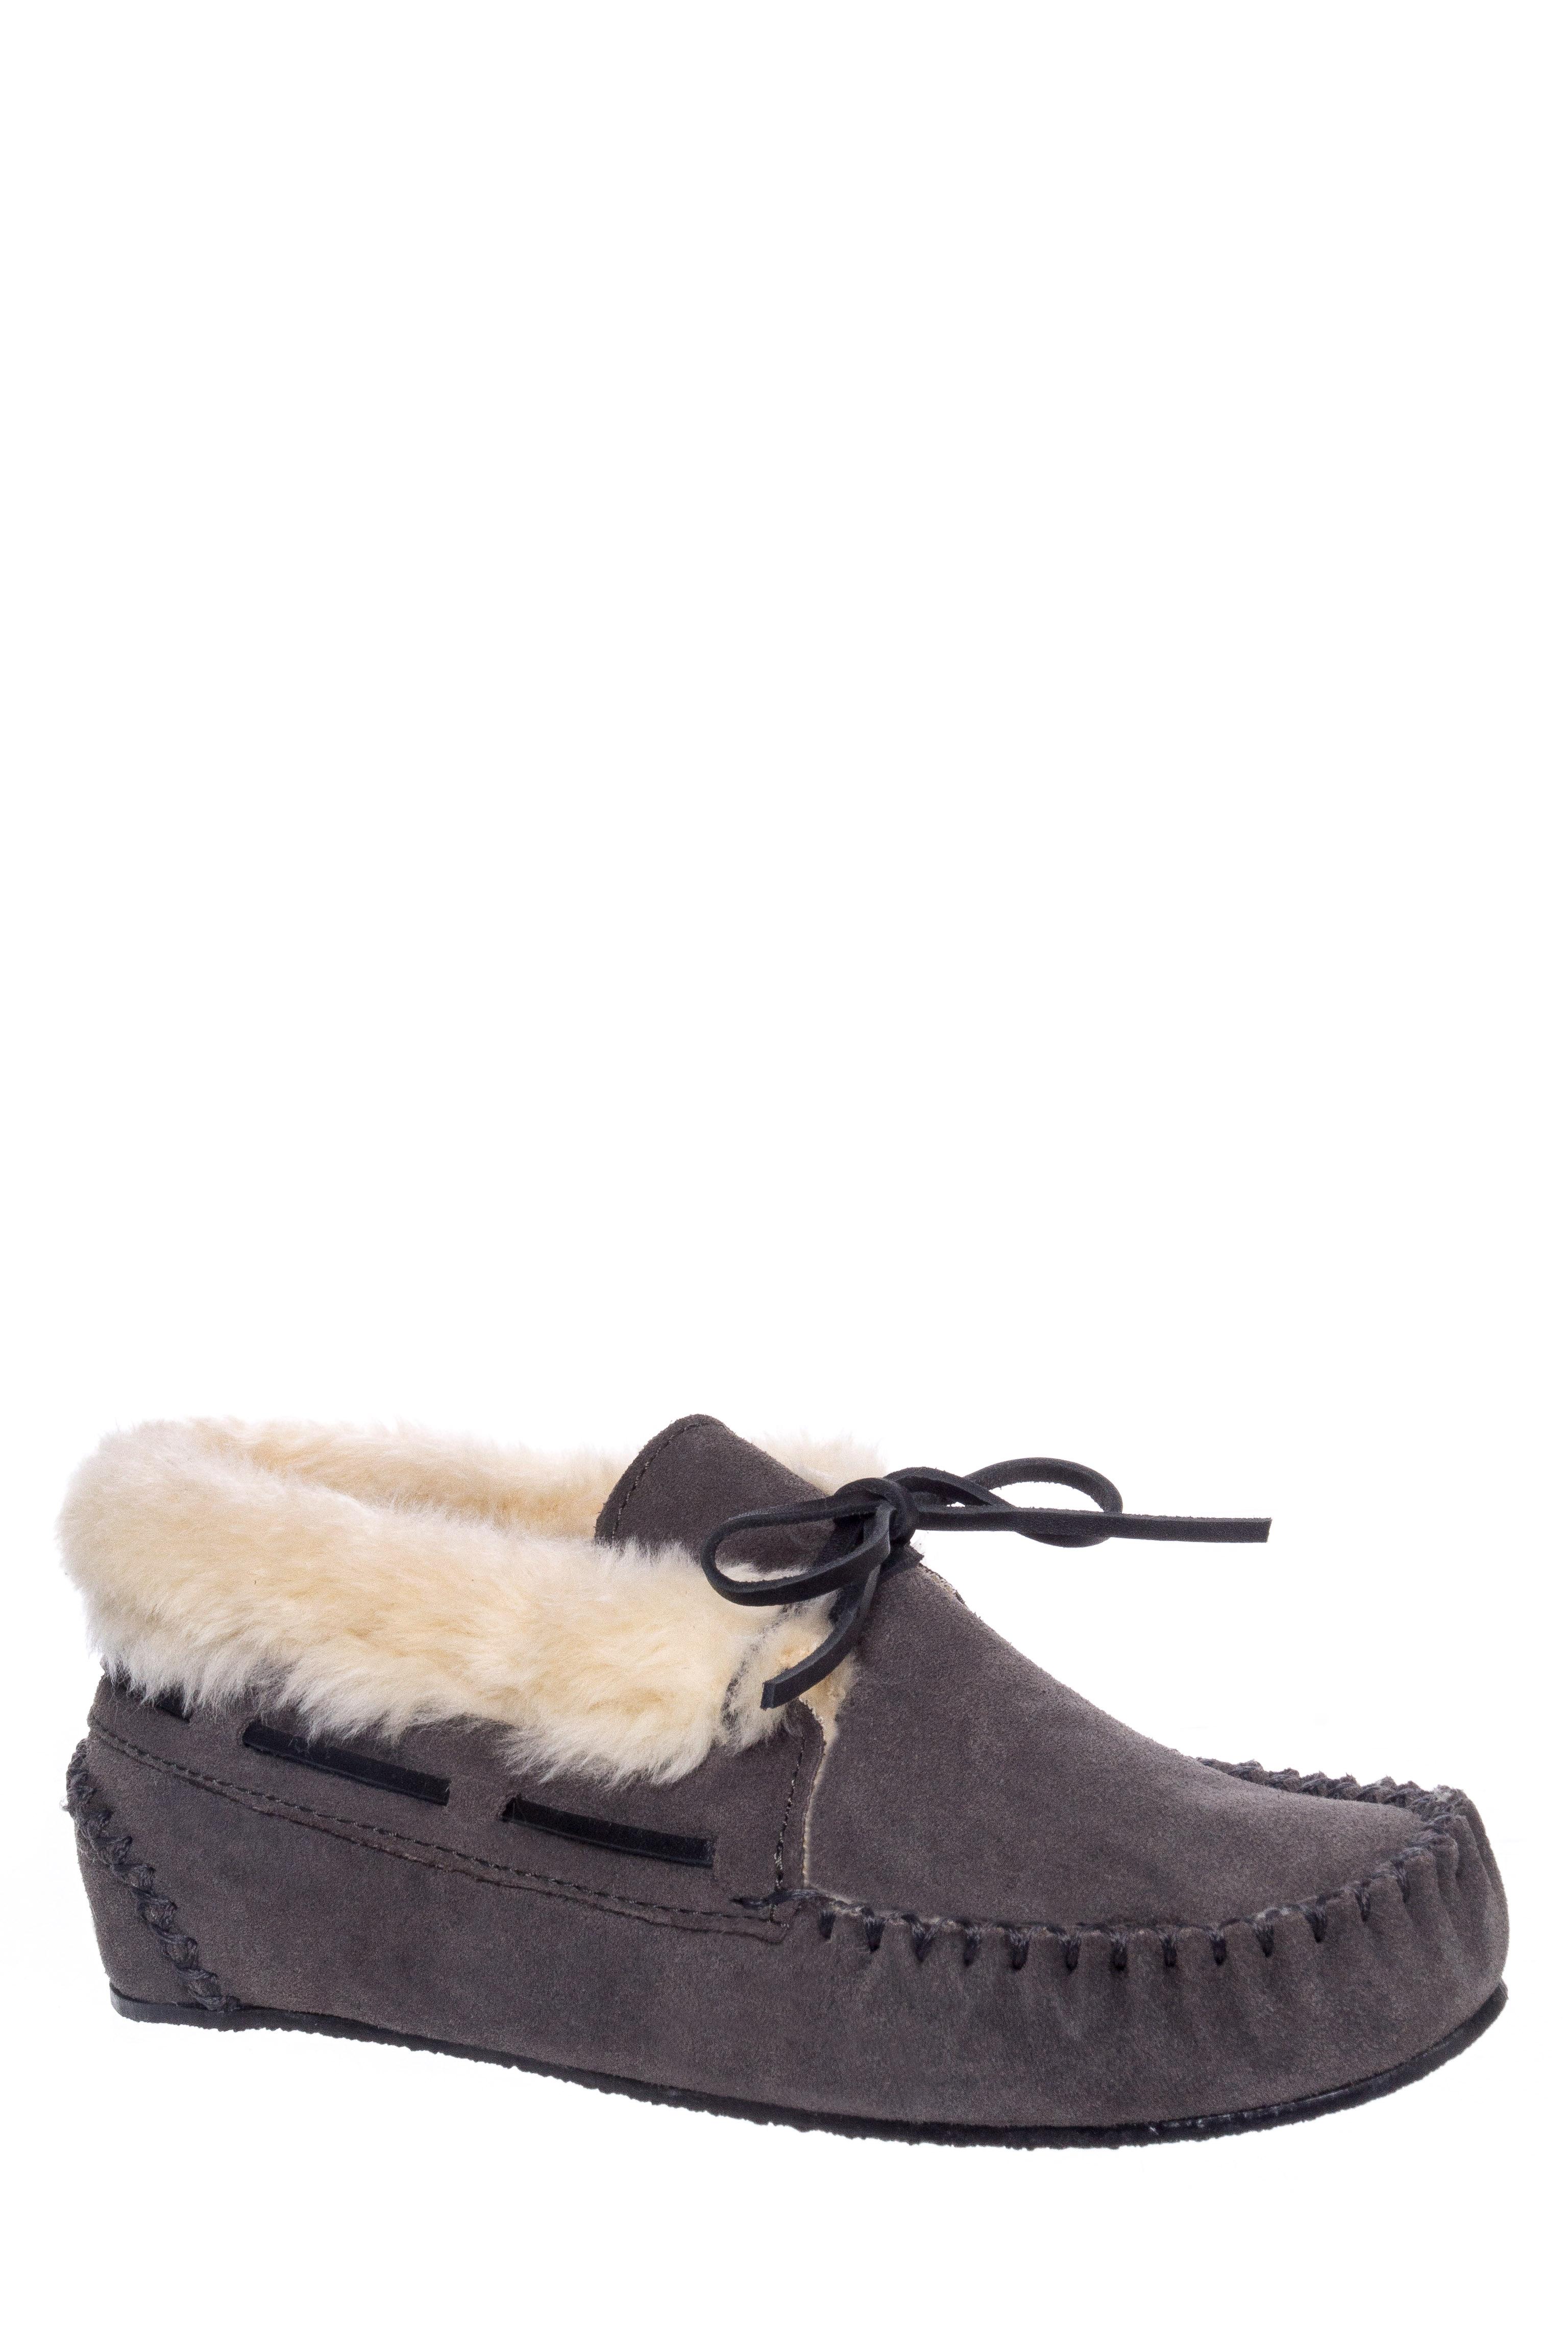 Minnetonka Chrissy Flats Boot